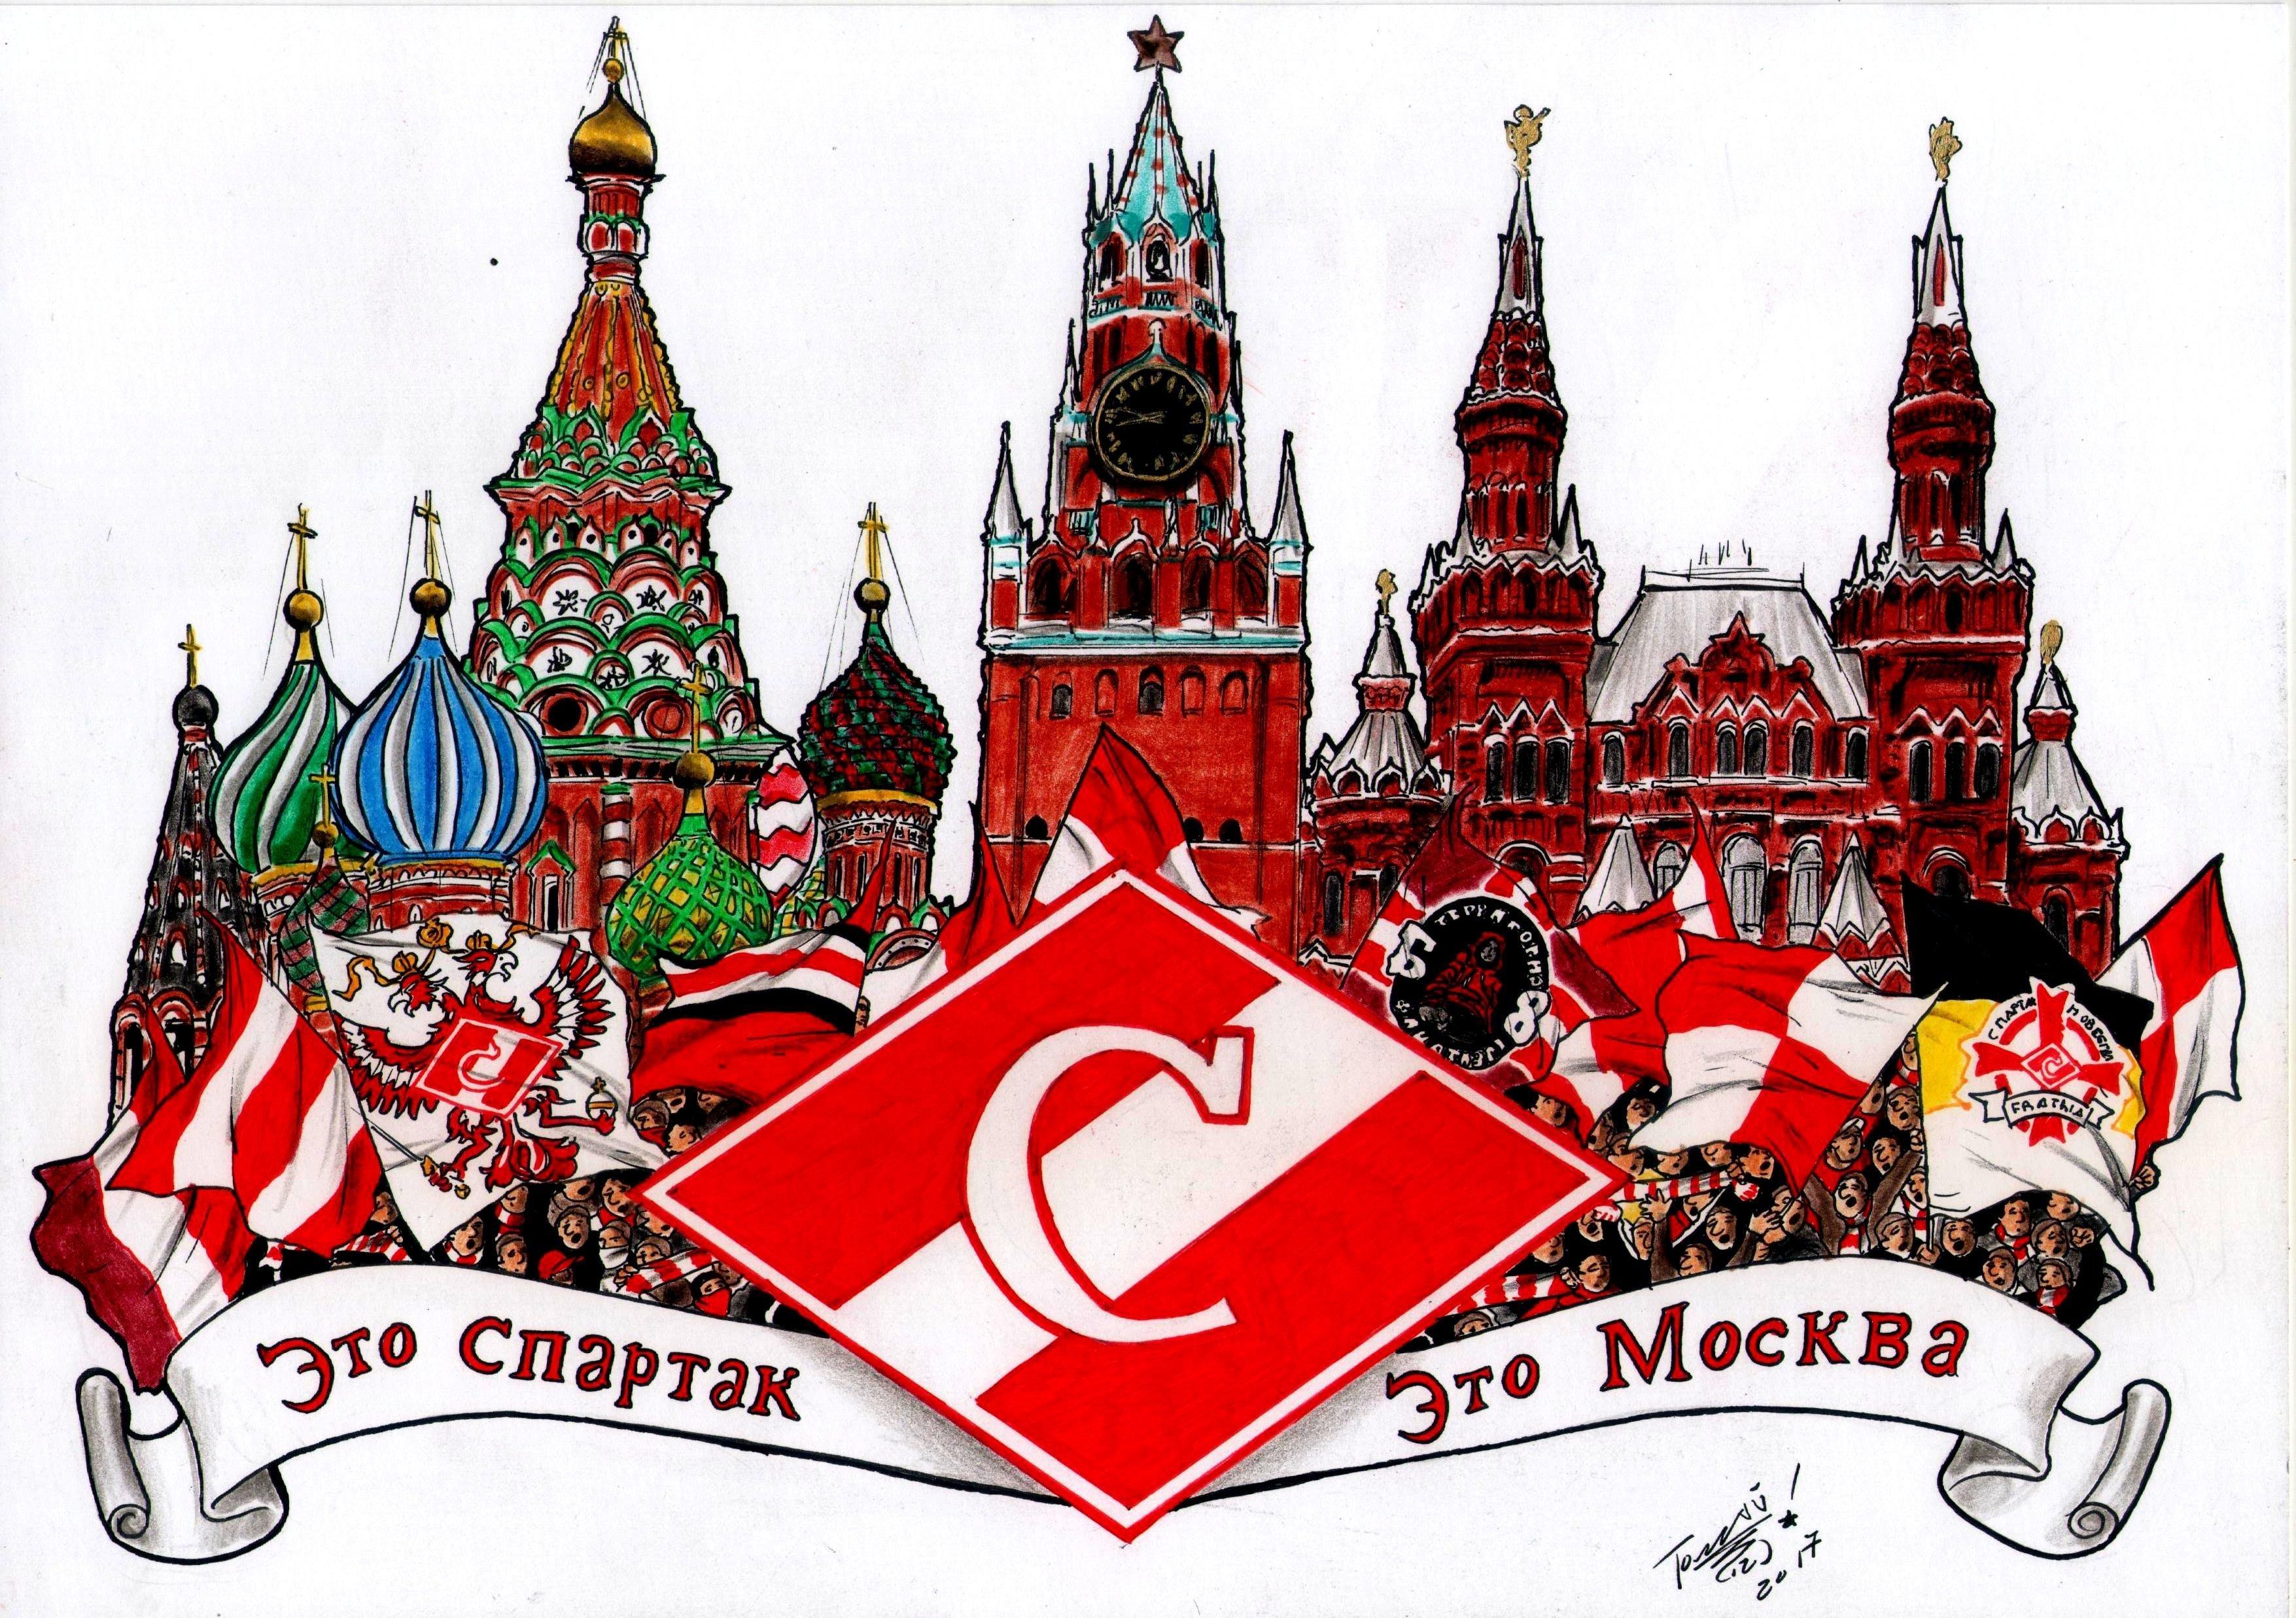 Homenaje al Spartak ruso